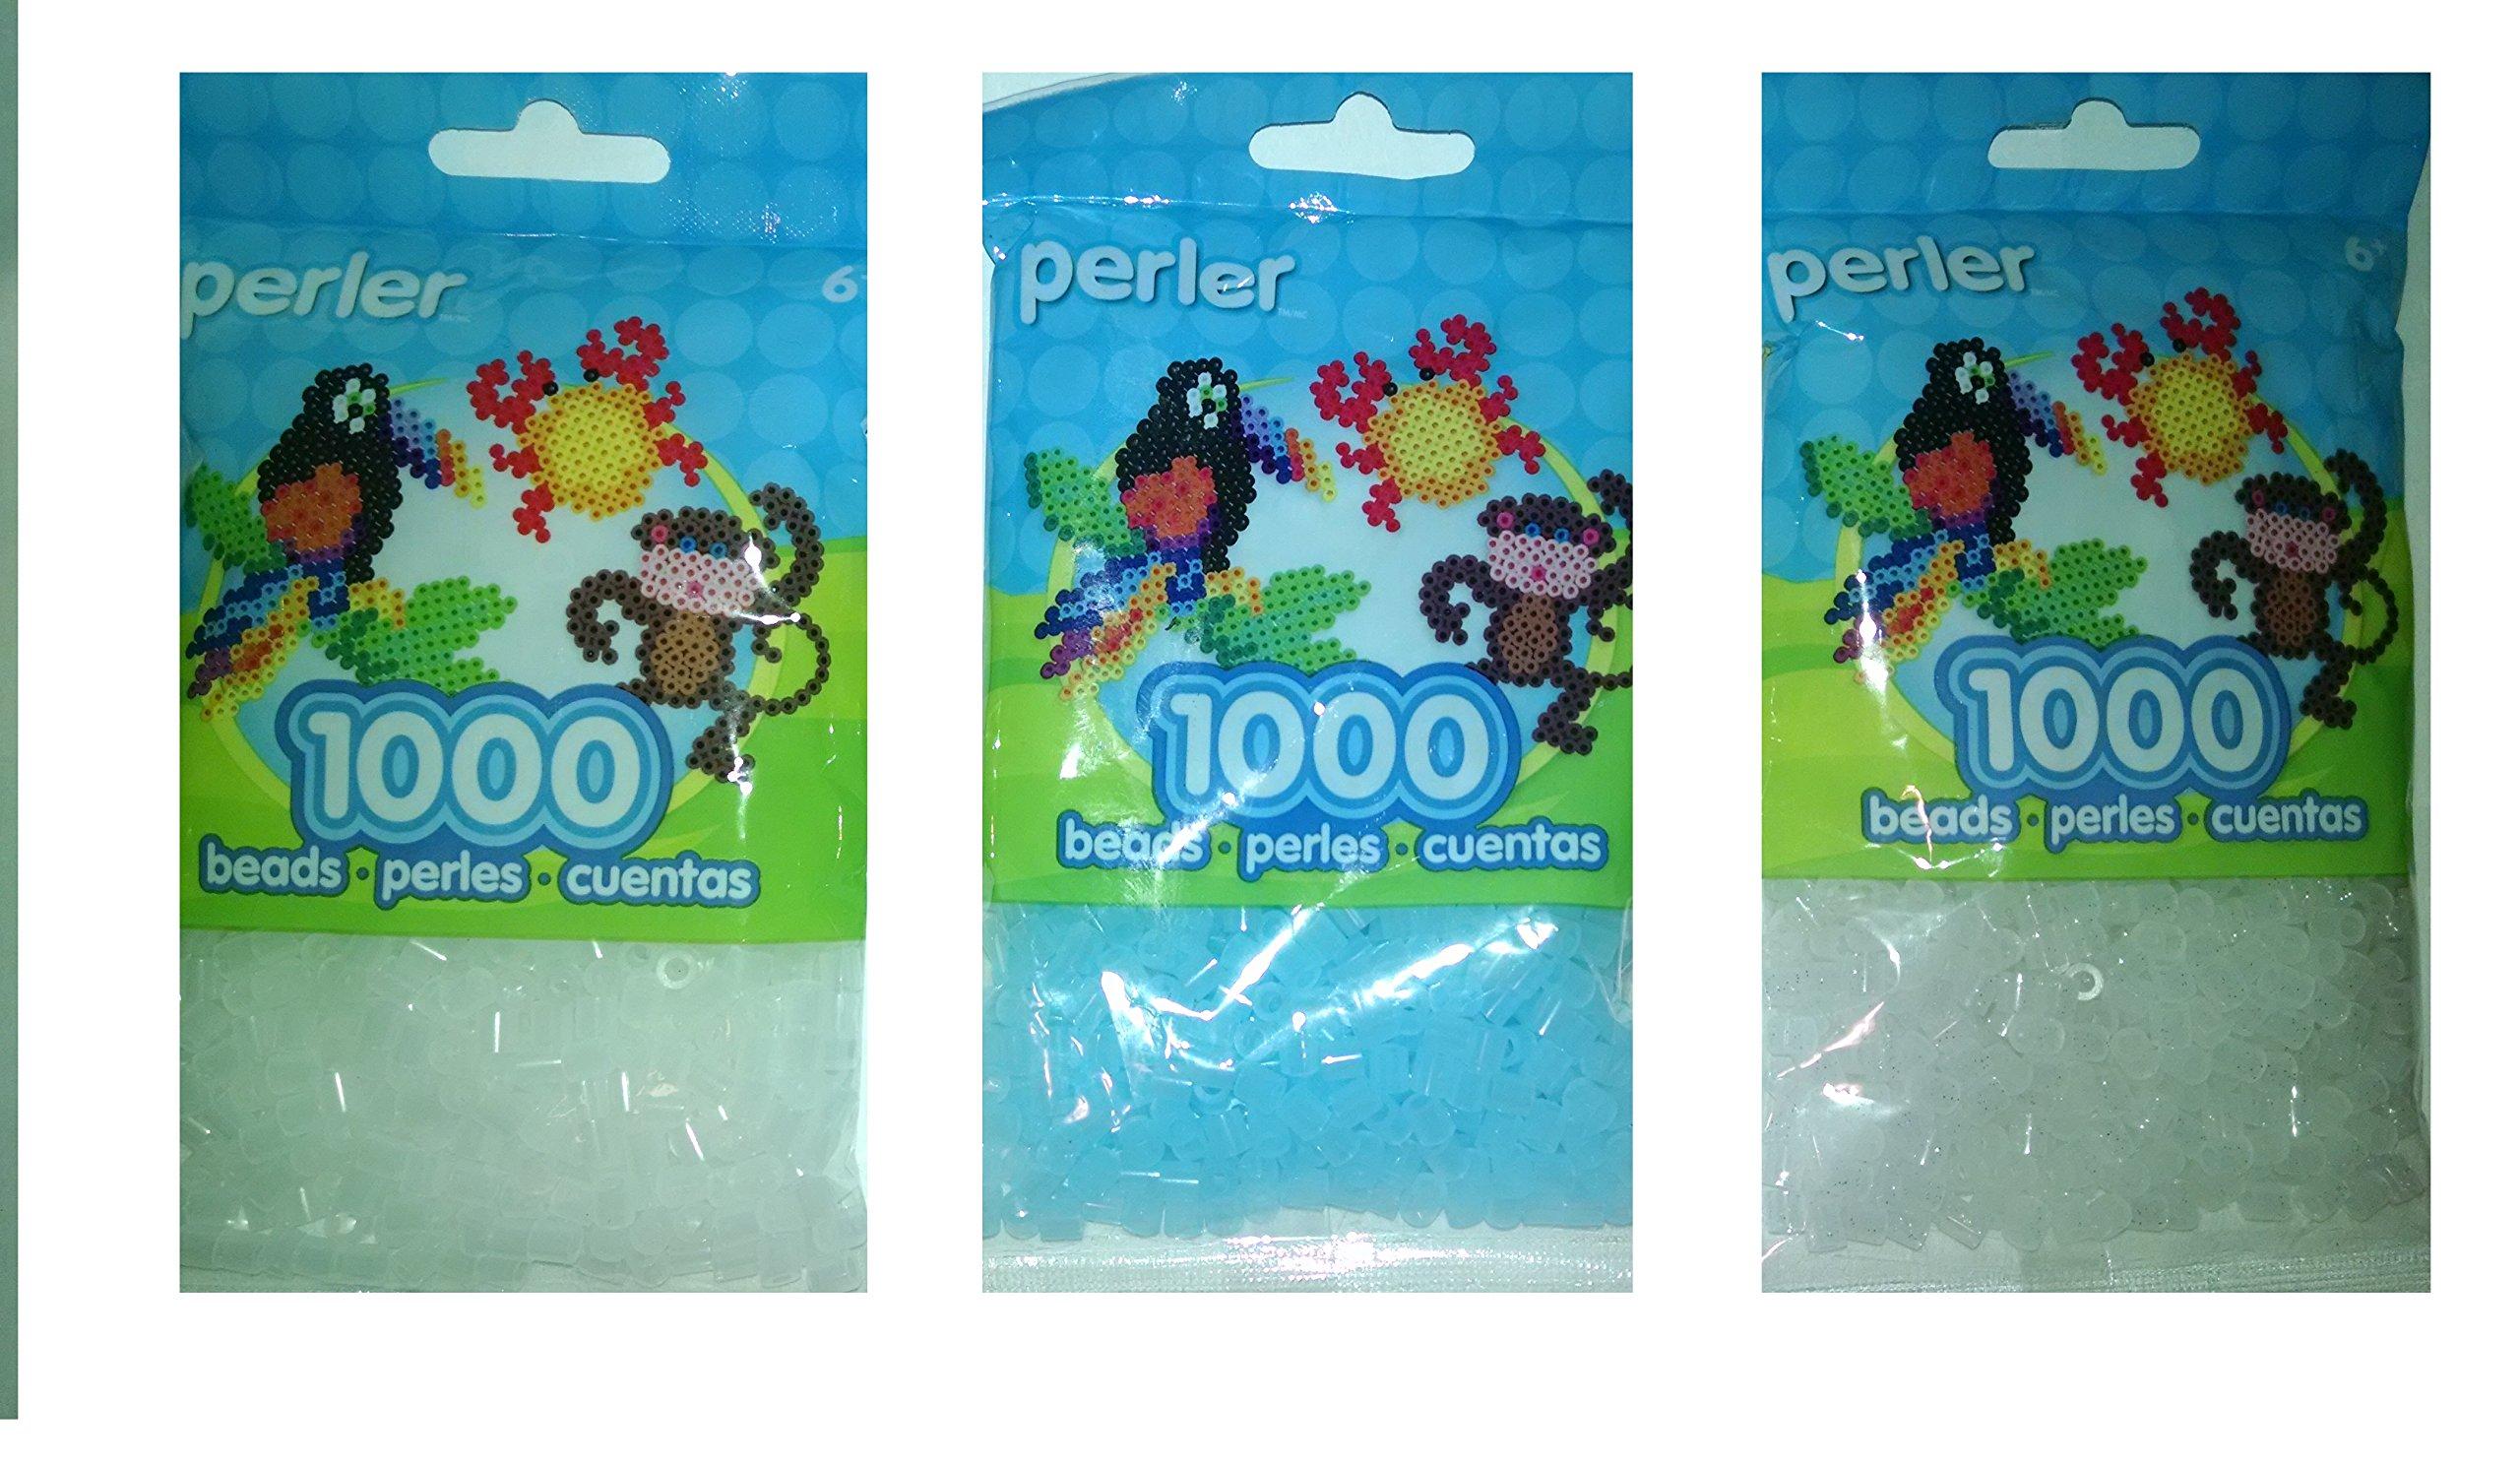 Perler Bead Bag, Group Clear, Clear Blue, Clear Glitter